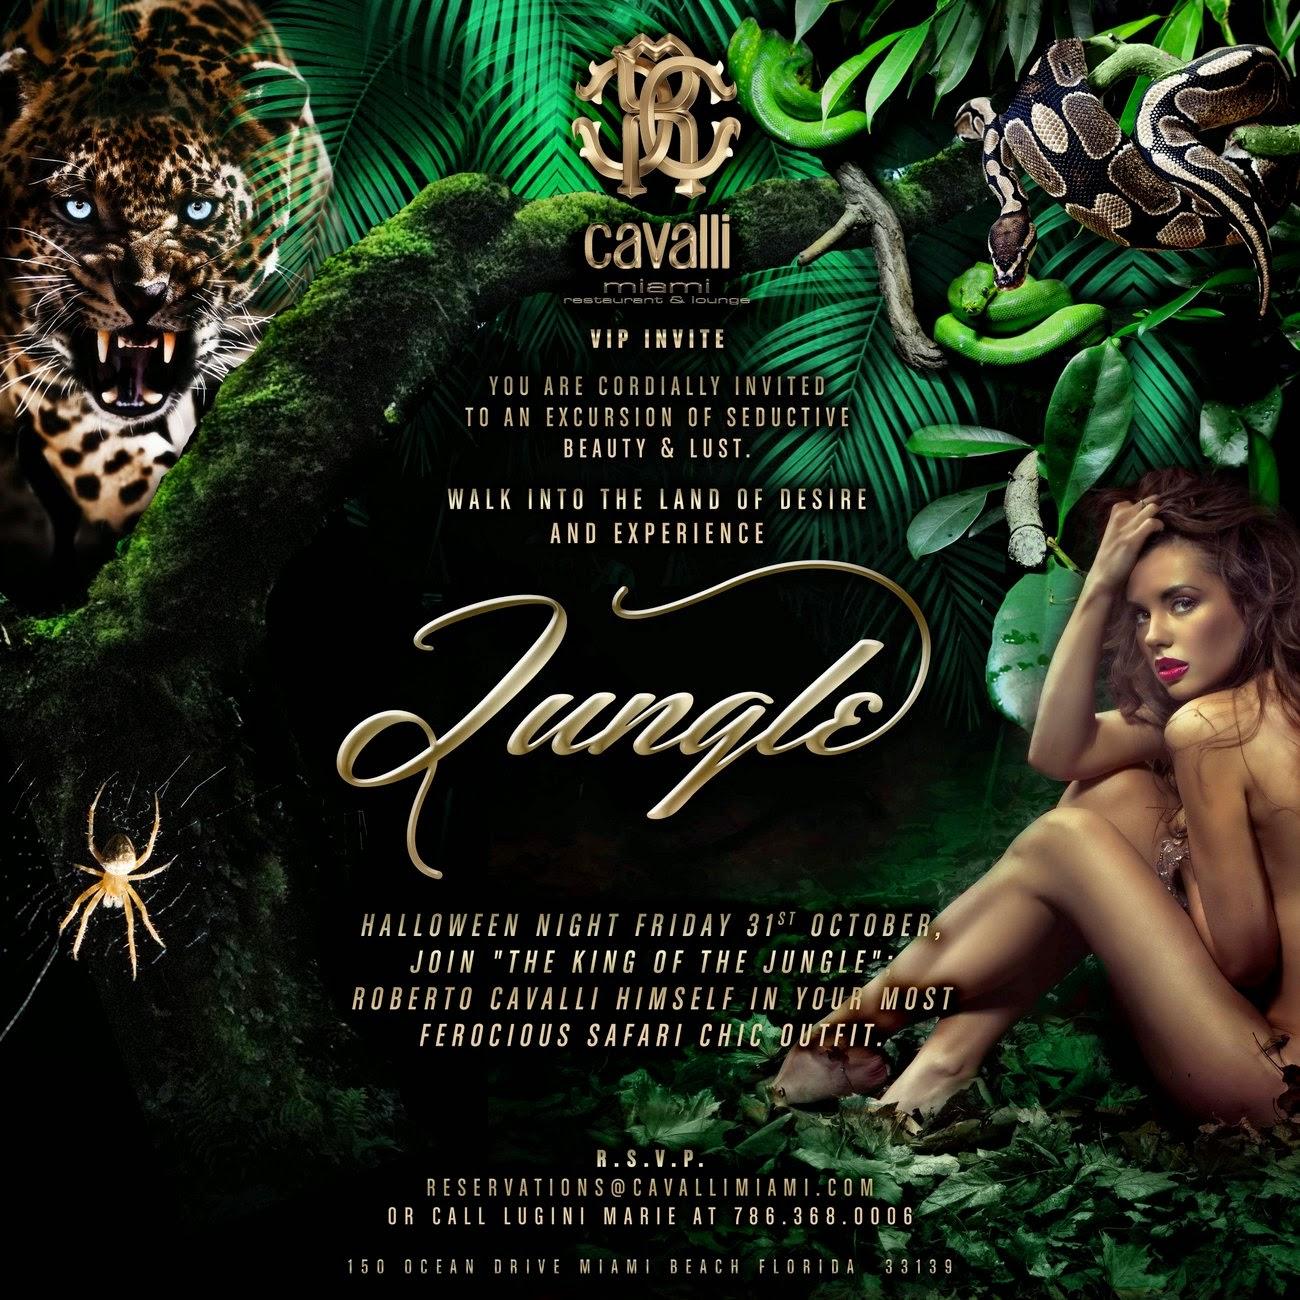 Roberto Cavalli Arriving in Miami to Host Jungle Themed Halloween Bash at Cavalli Miami